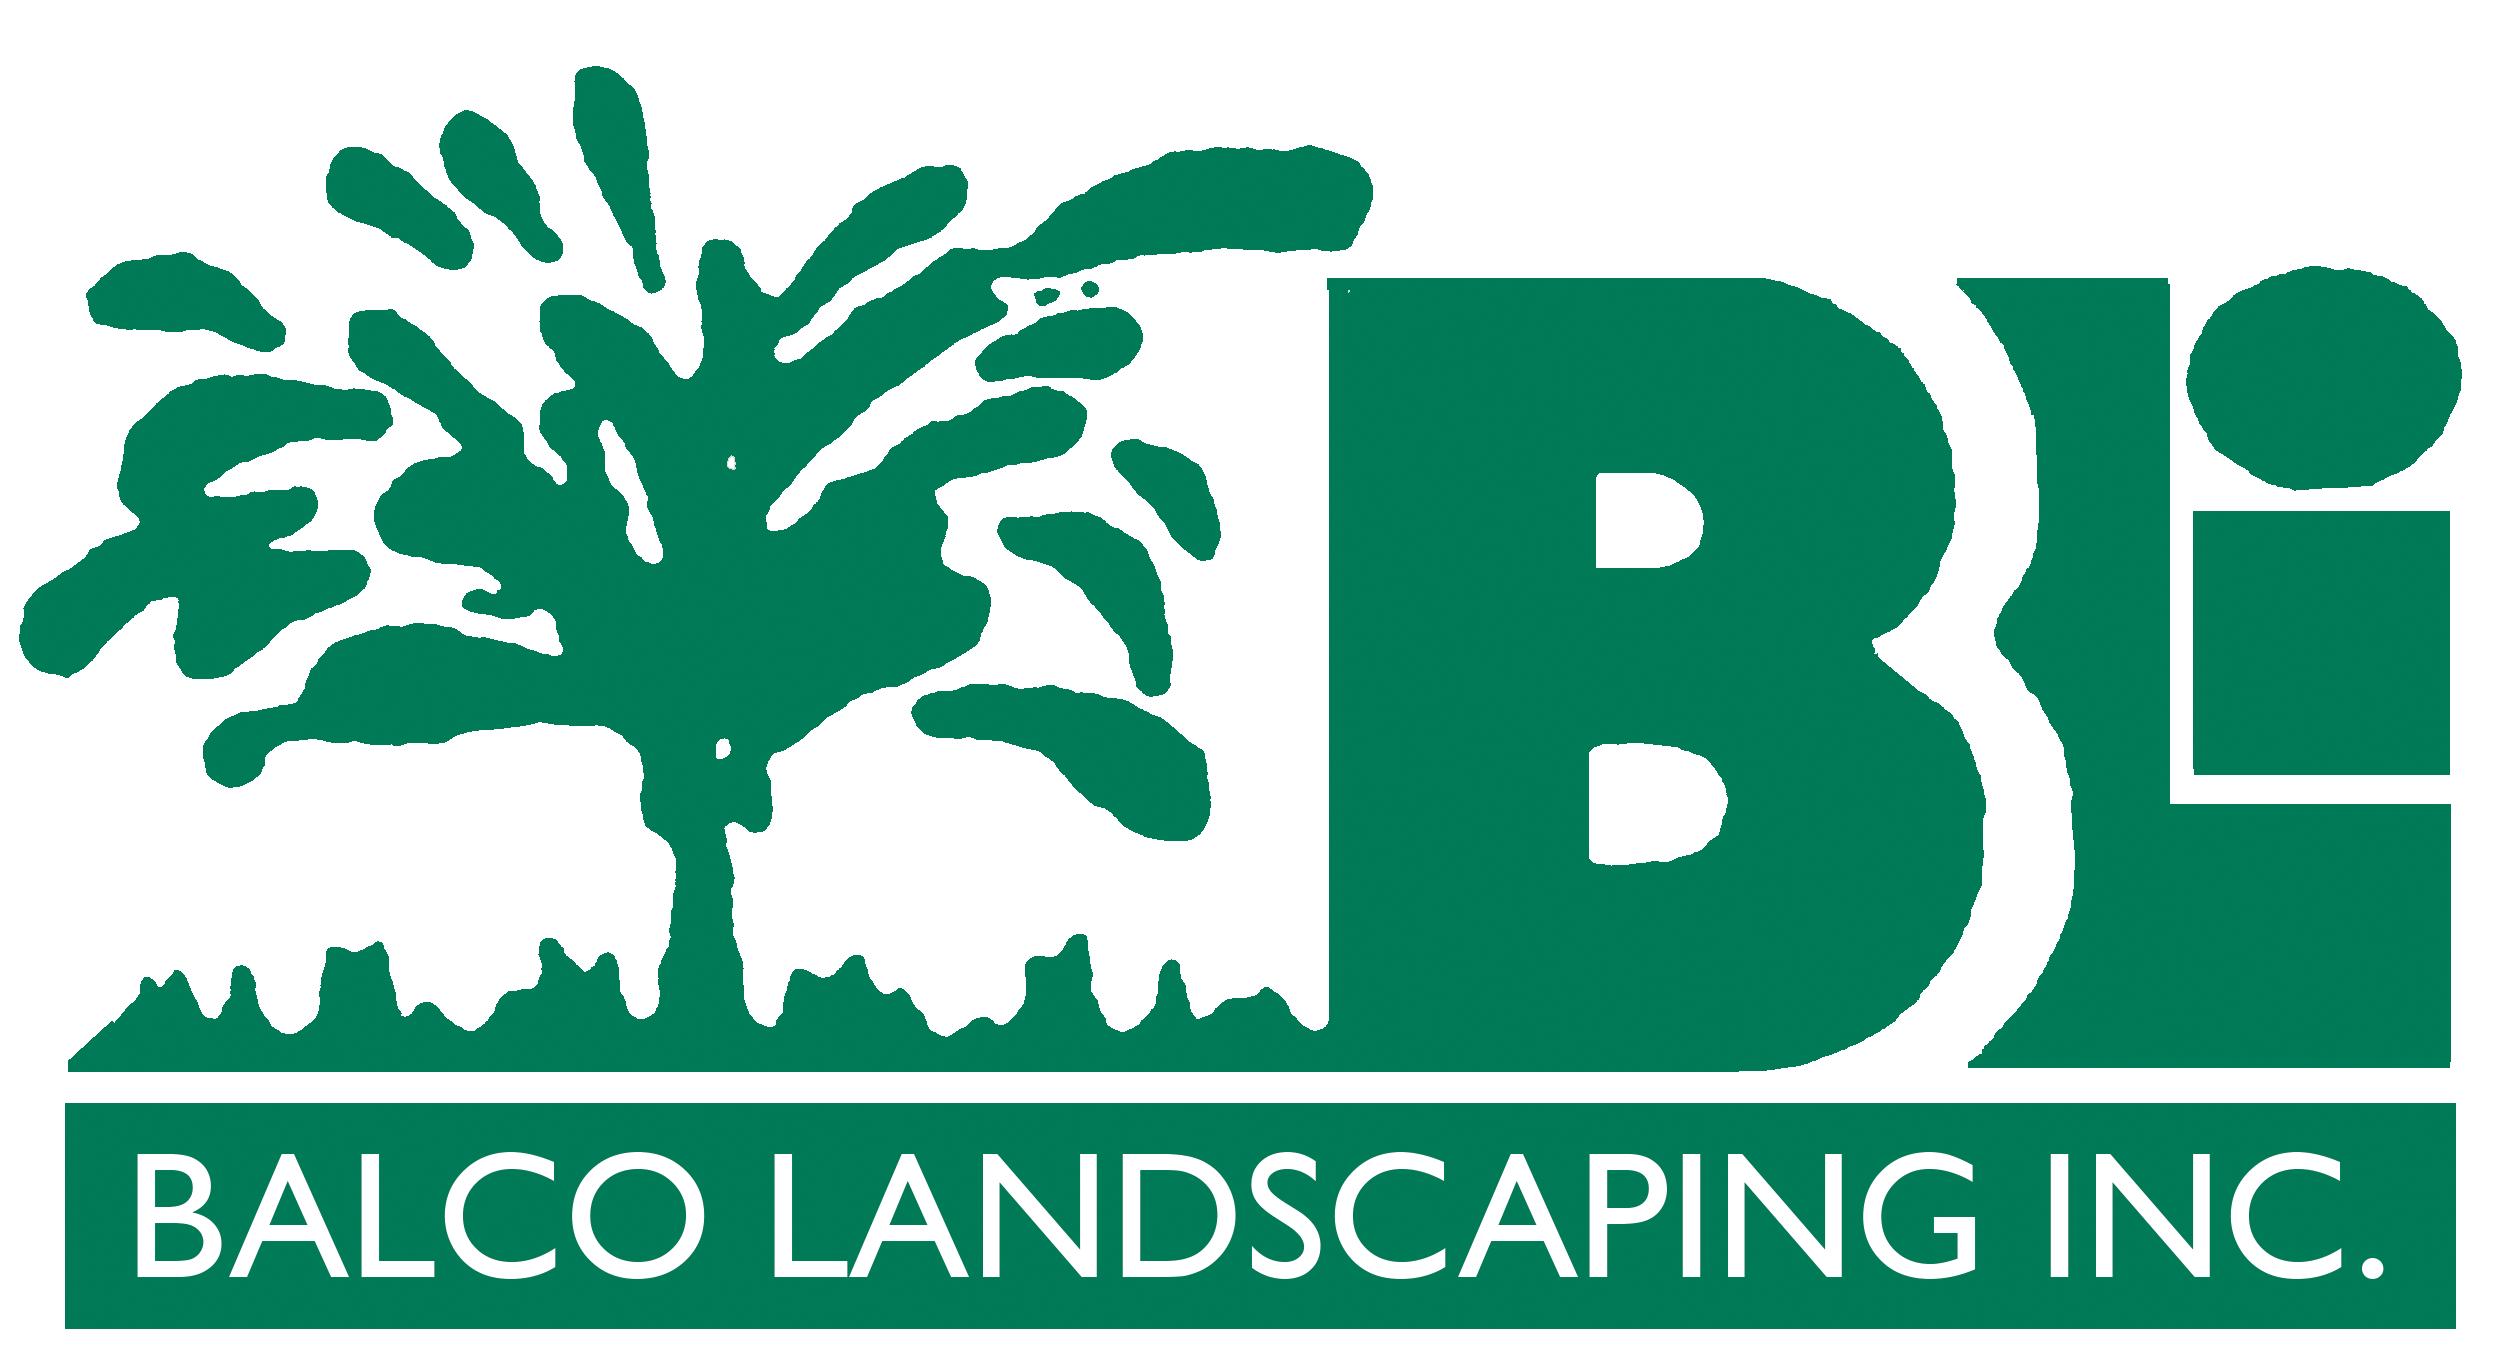 Balco Landscaping Inc.